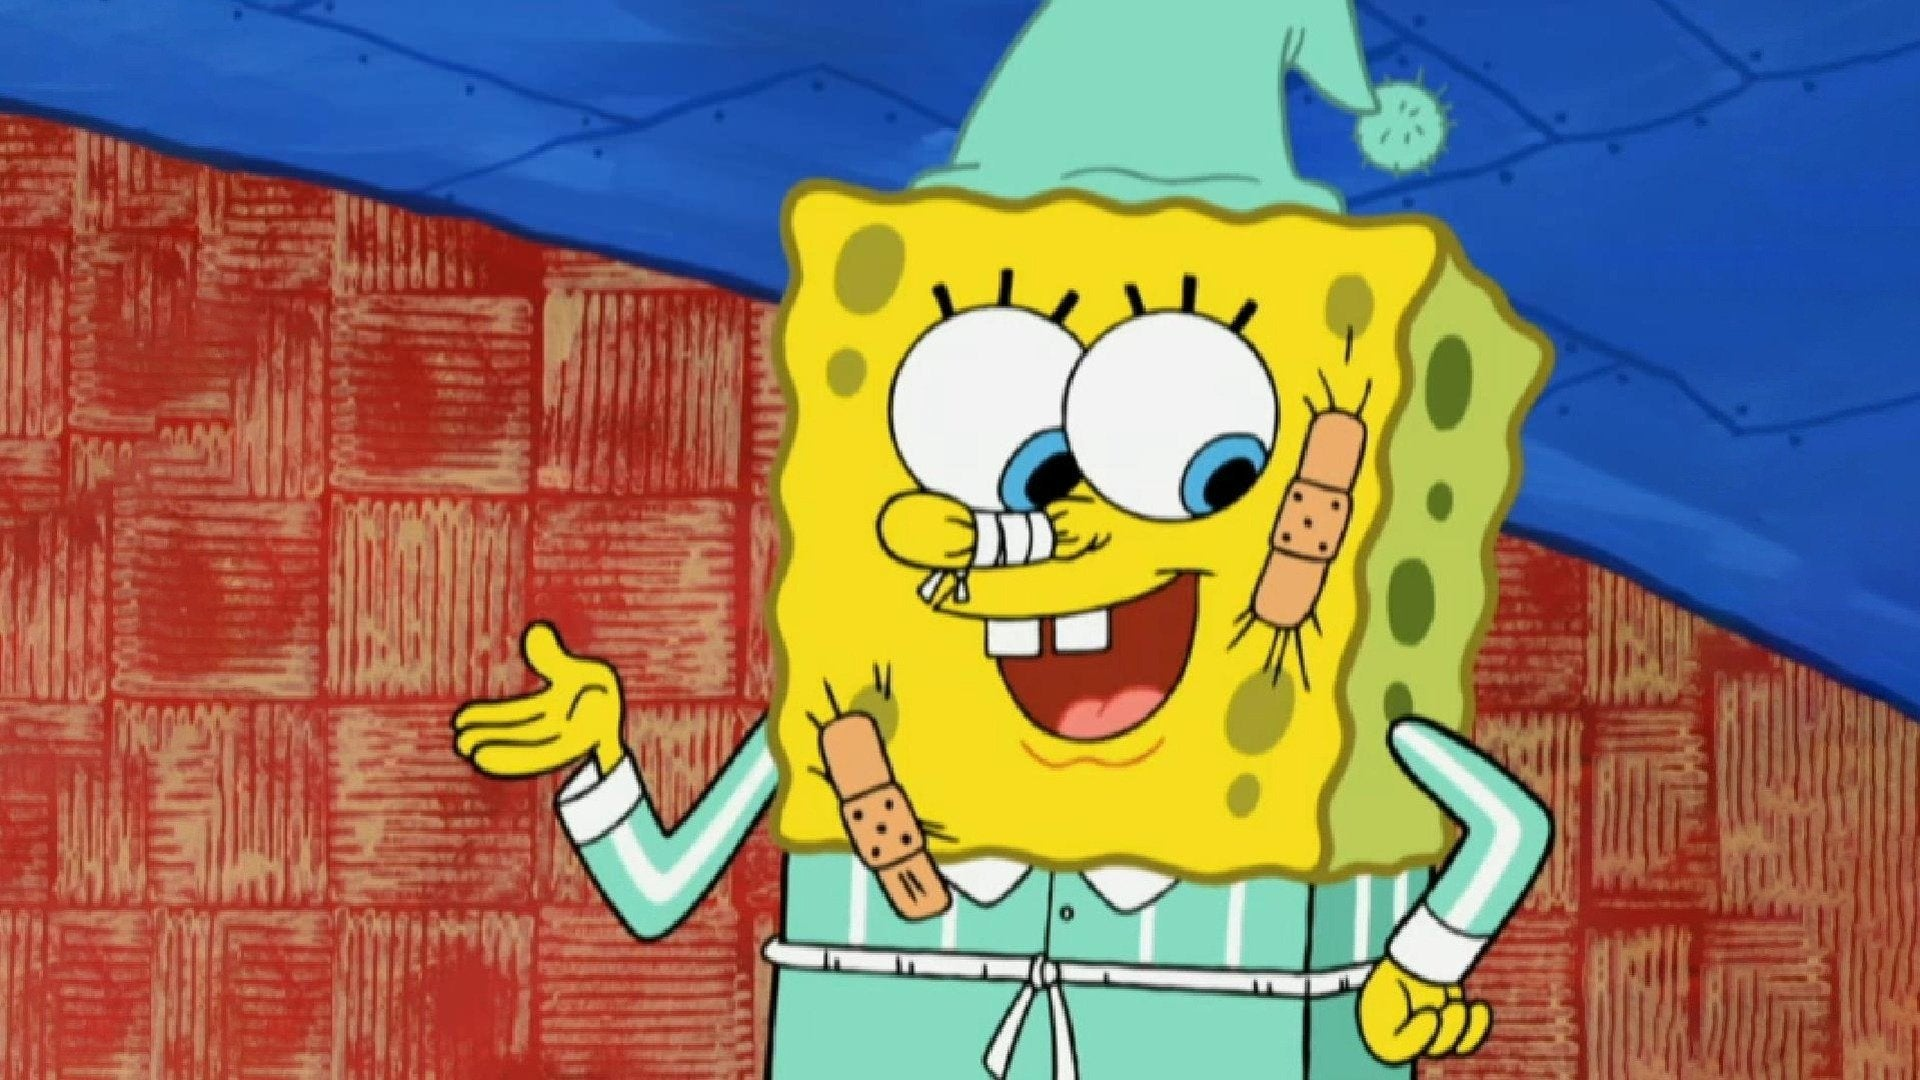 Spongebob Squarepants Pets Or Pests Komputer Overload On Philo